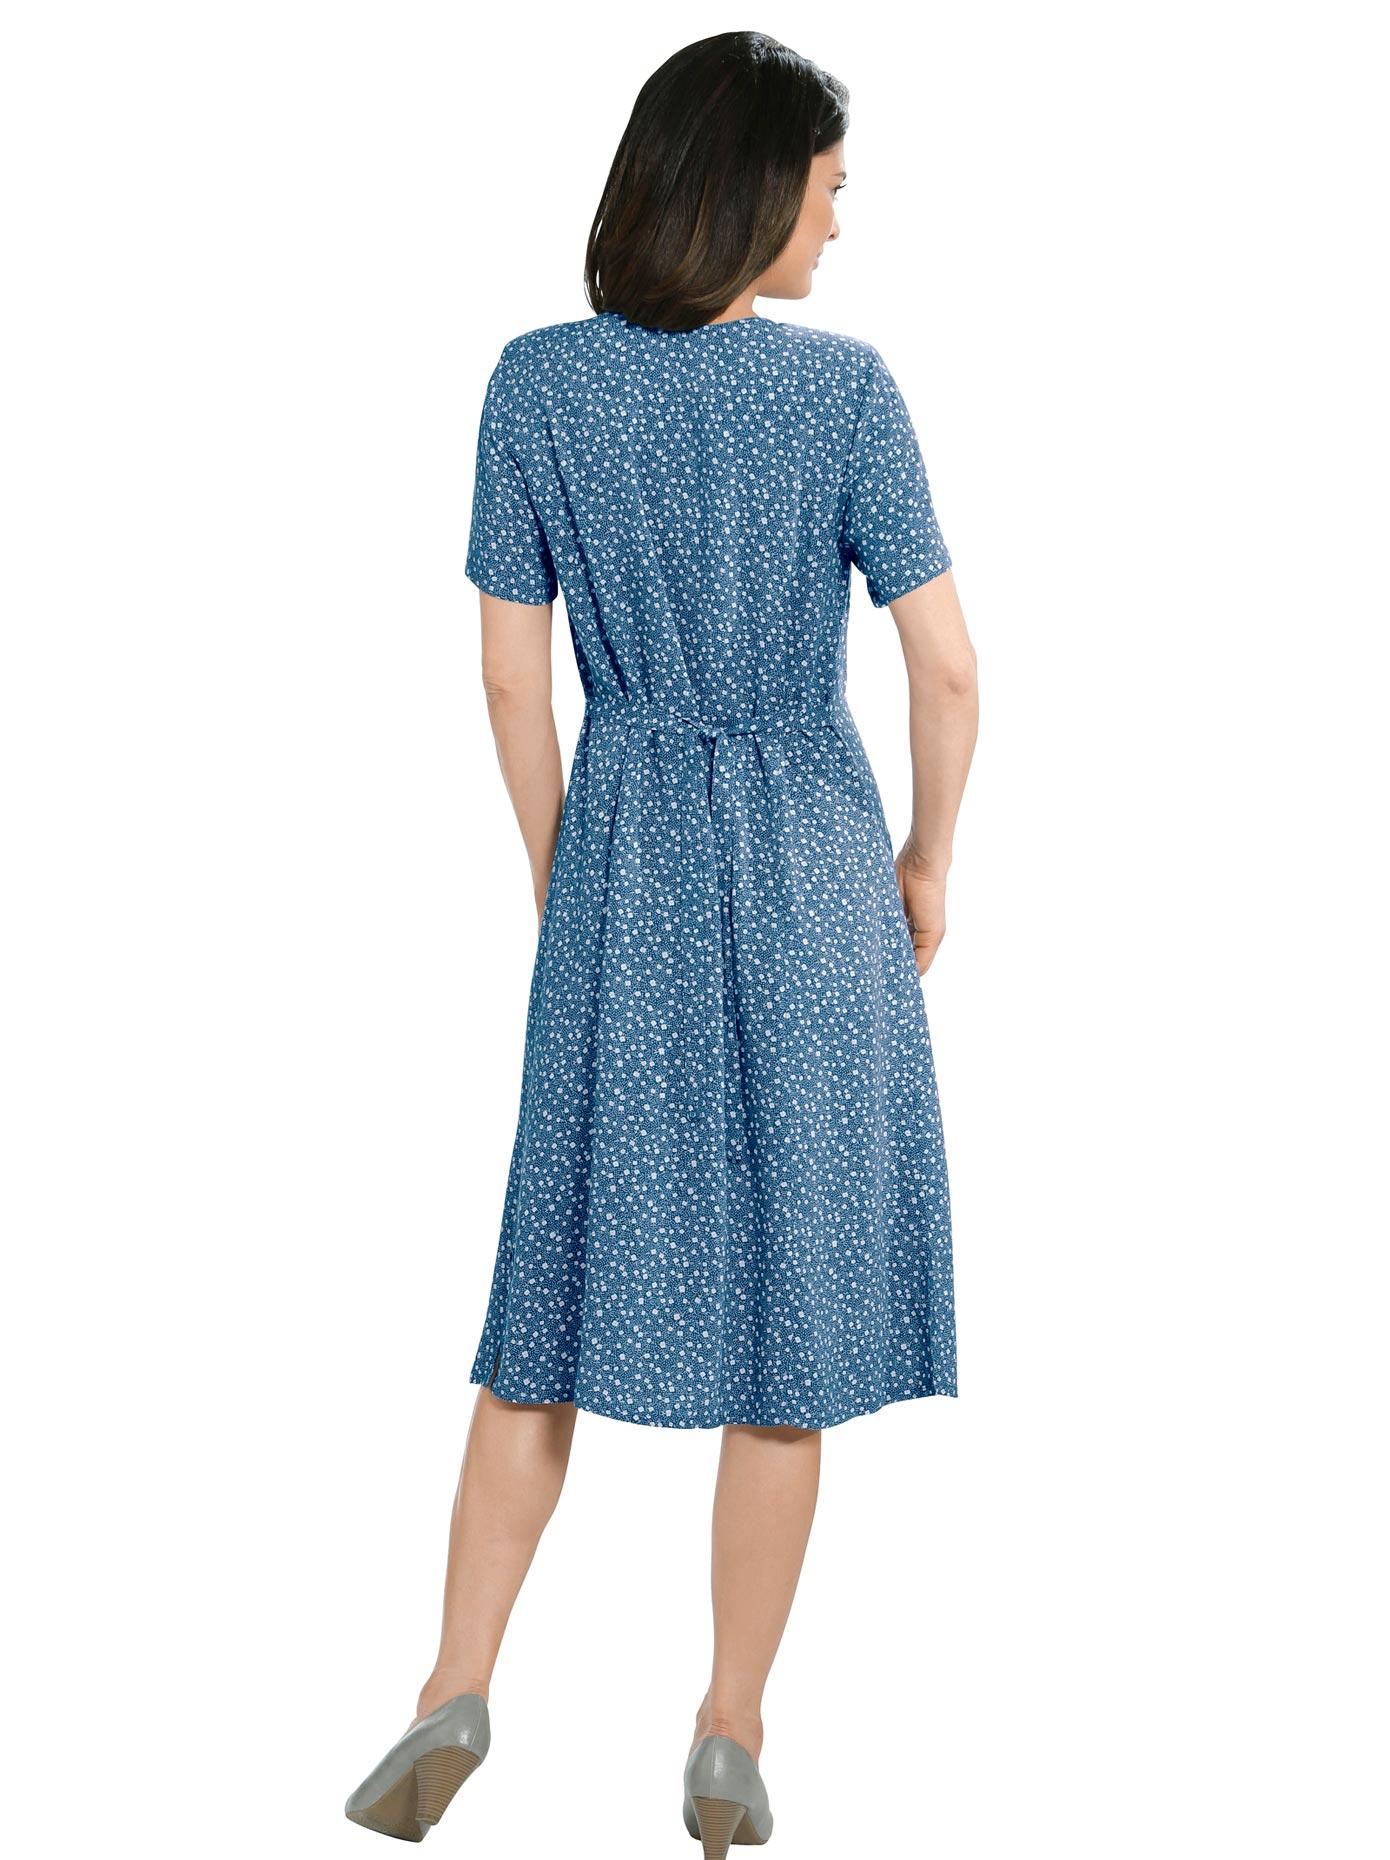 Classic Basics Kleid mit V-Ausschnitt